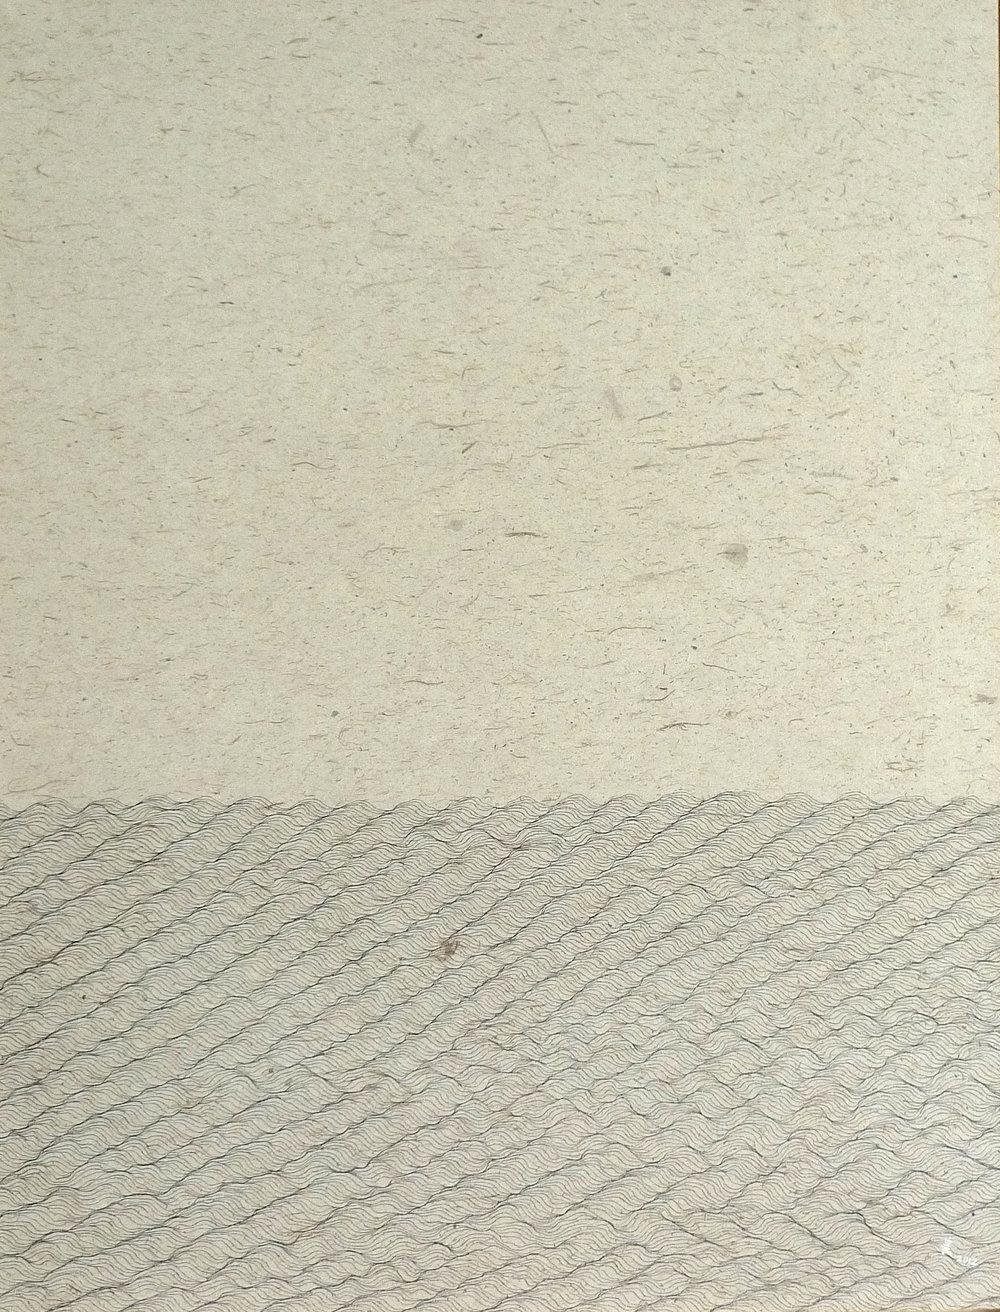 Zhou Jianjun 周建军, Untitled 无题, 2013, Ink on paper 纸本水墨设色, 121 x 93 cm